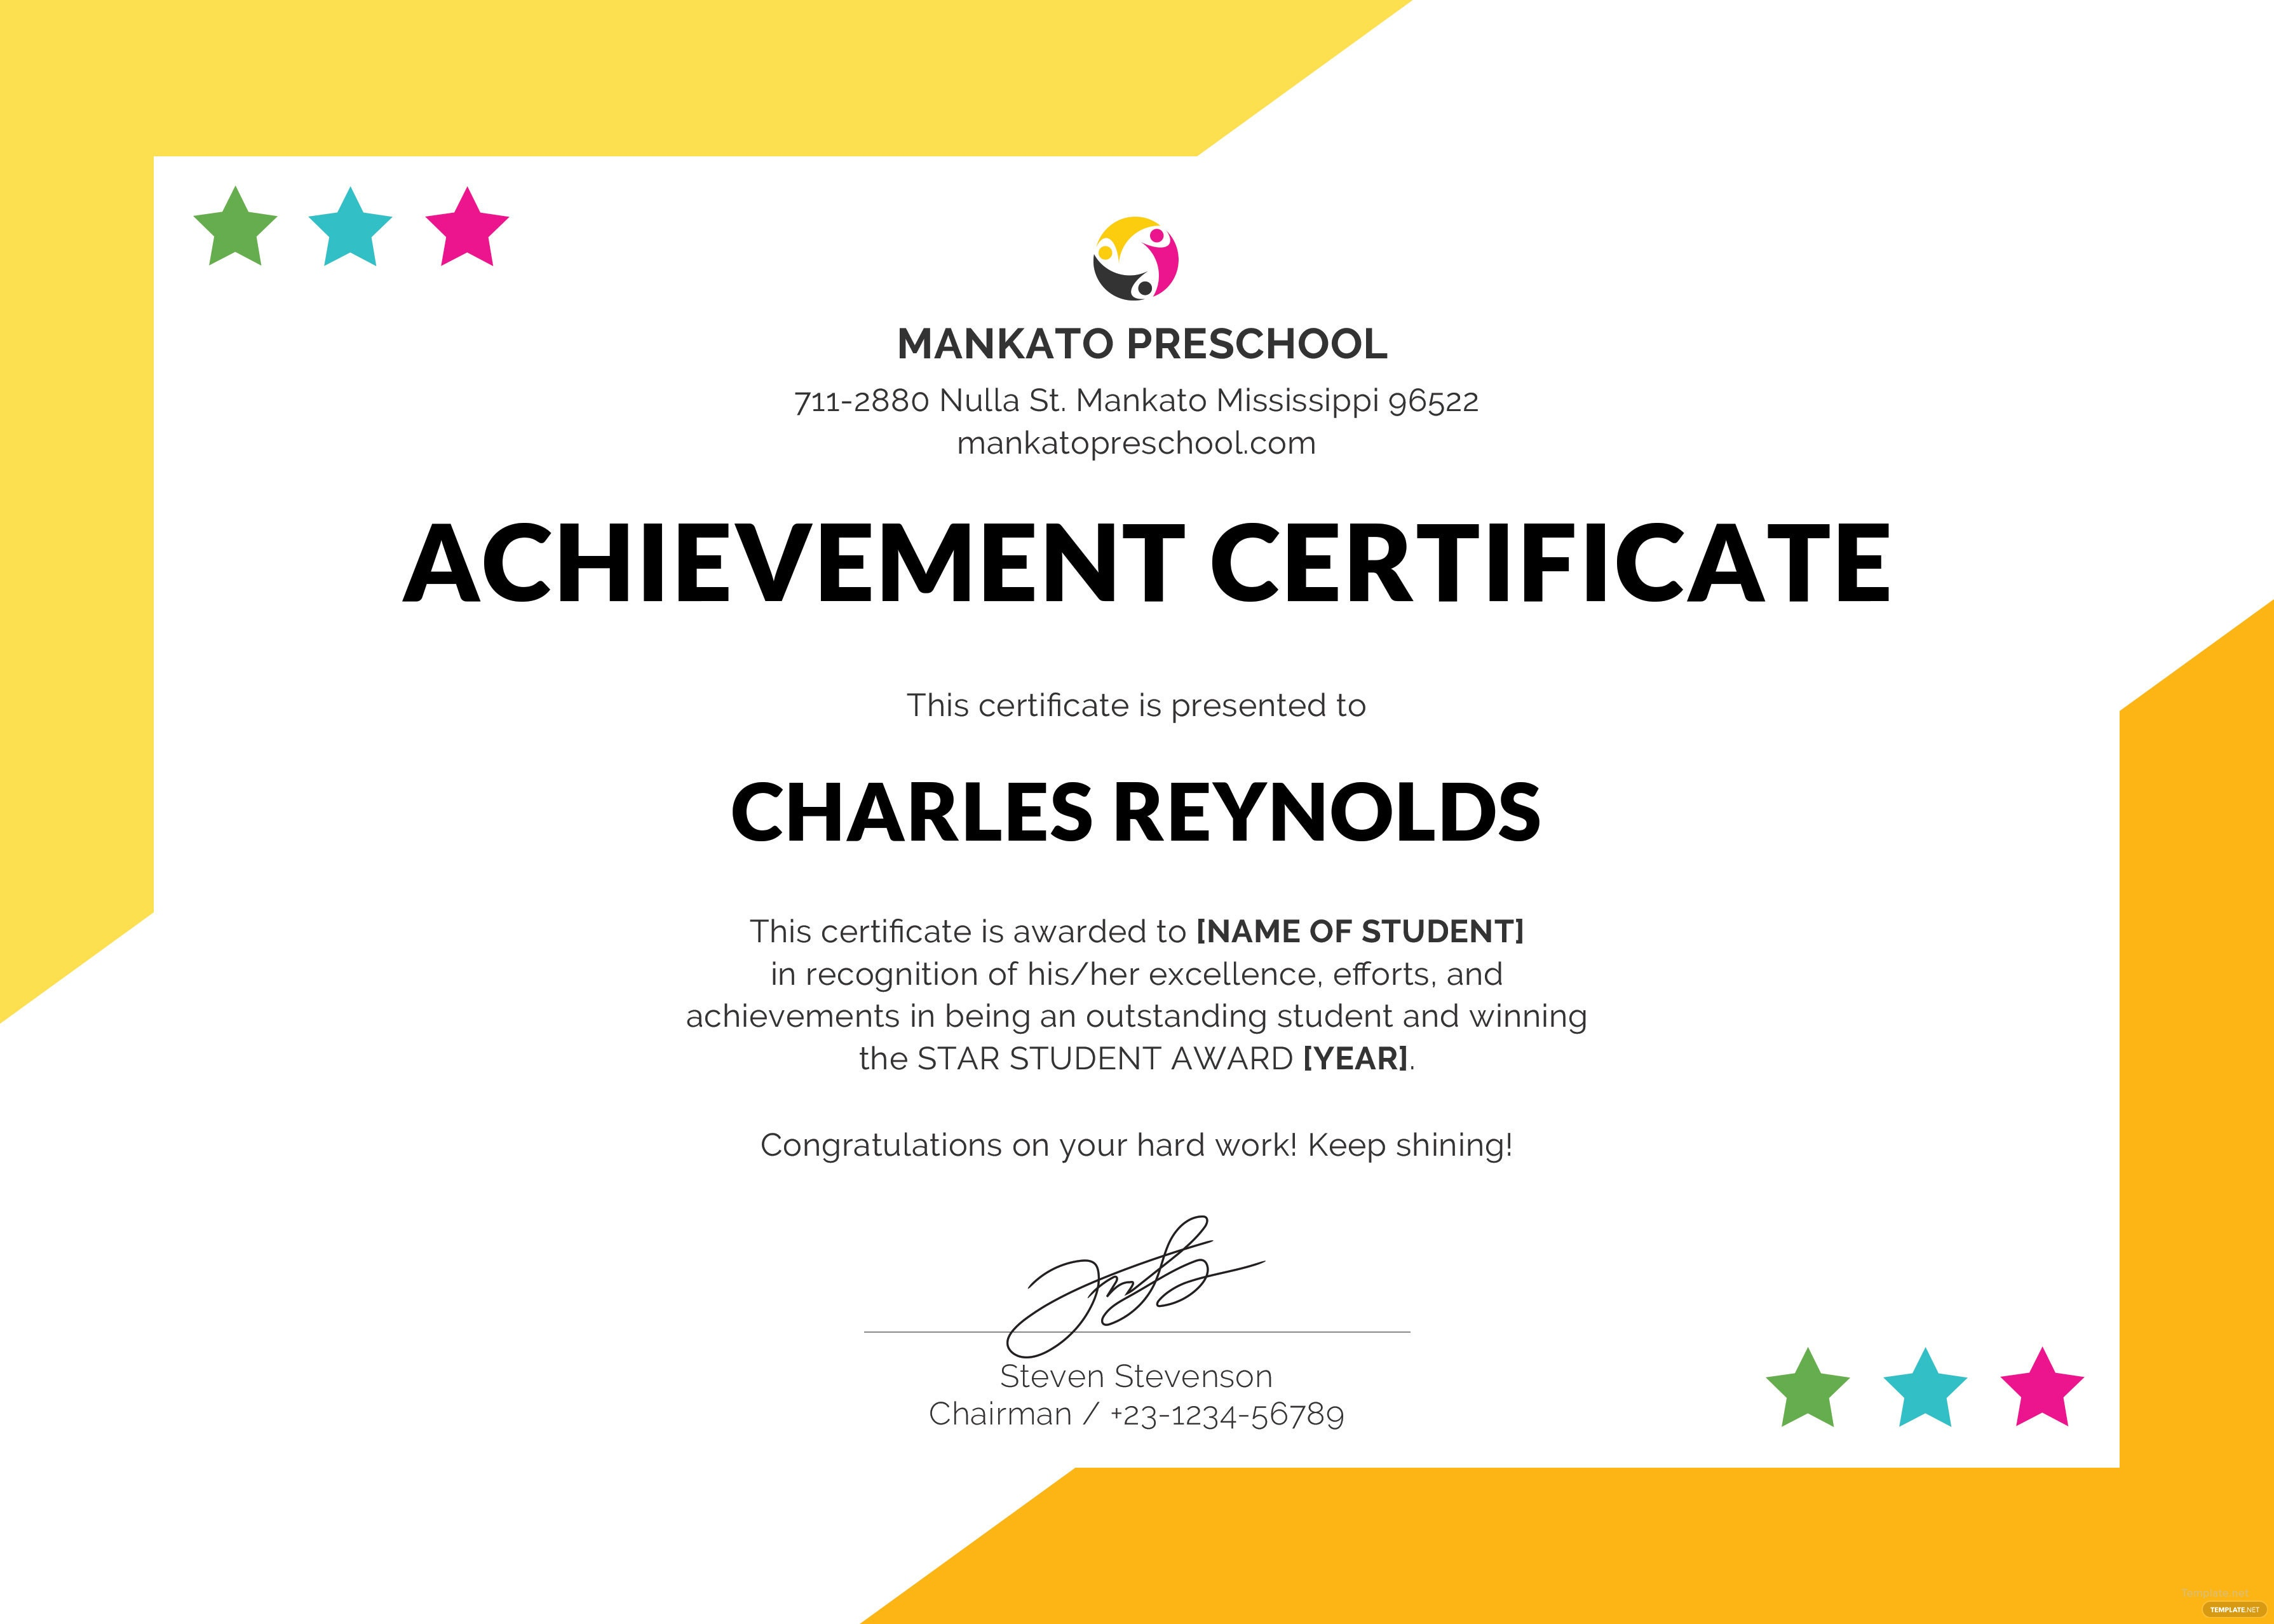 Free preschool internship certificate template in psd ms word preschool internship certificate template yelopaper Images